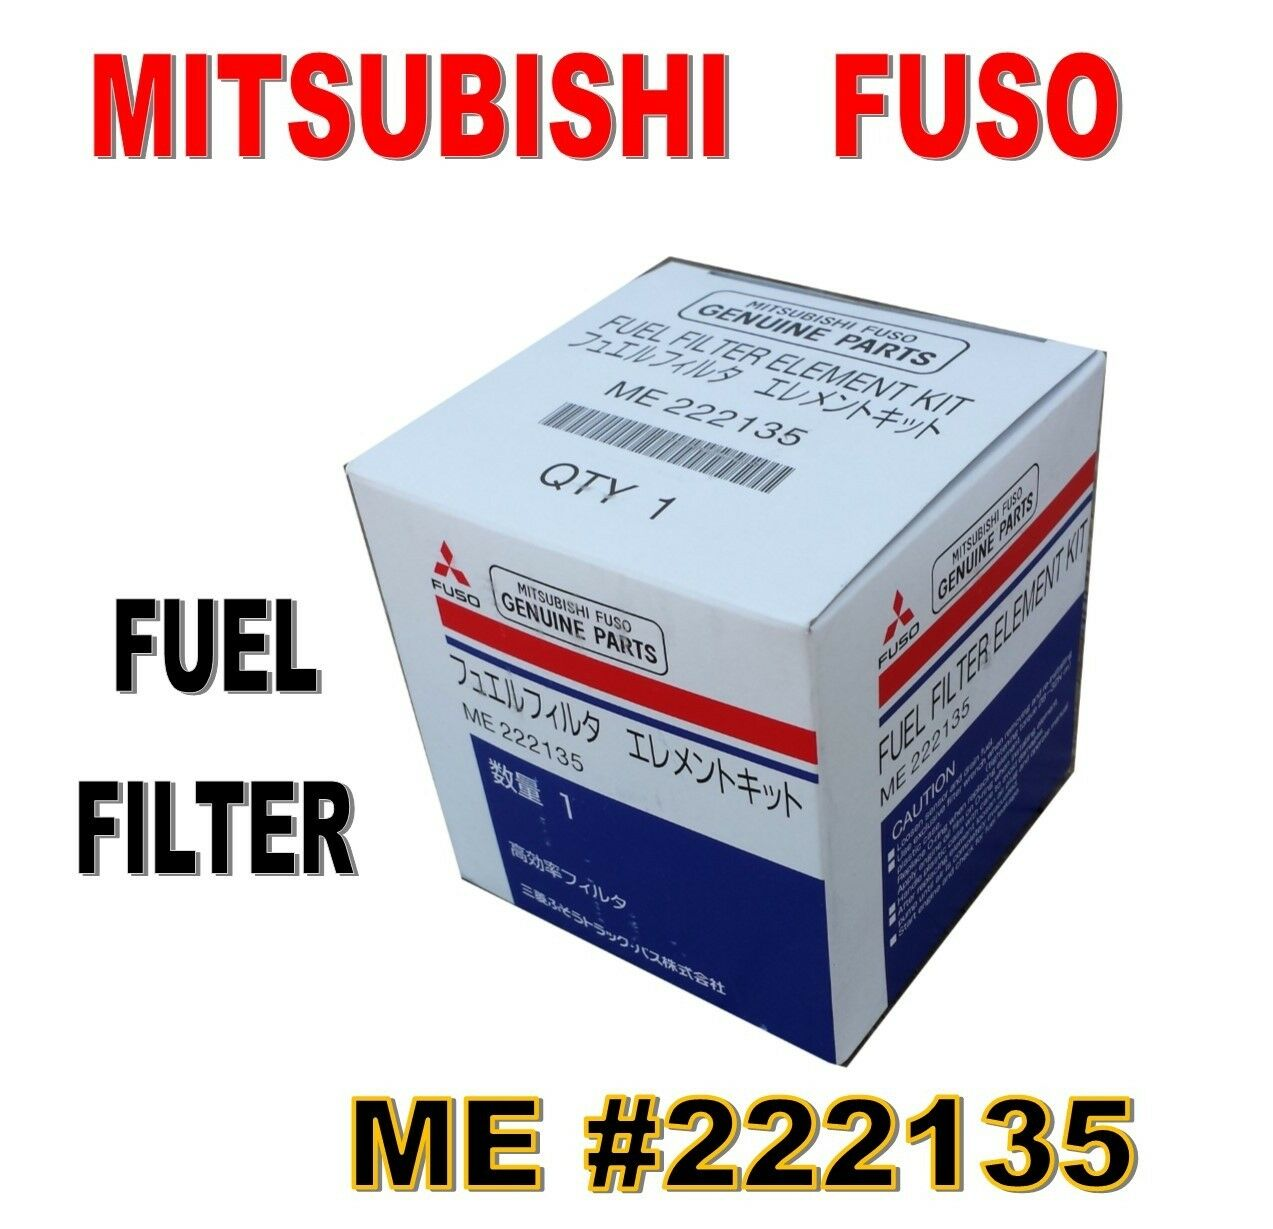 Mitsubishi Fuso Fuel Filter  Me222135  4 Each  Fuso Fe Fg